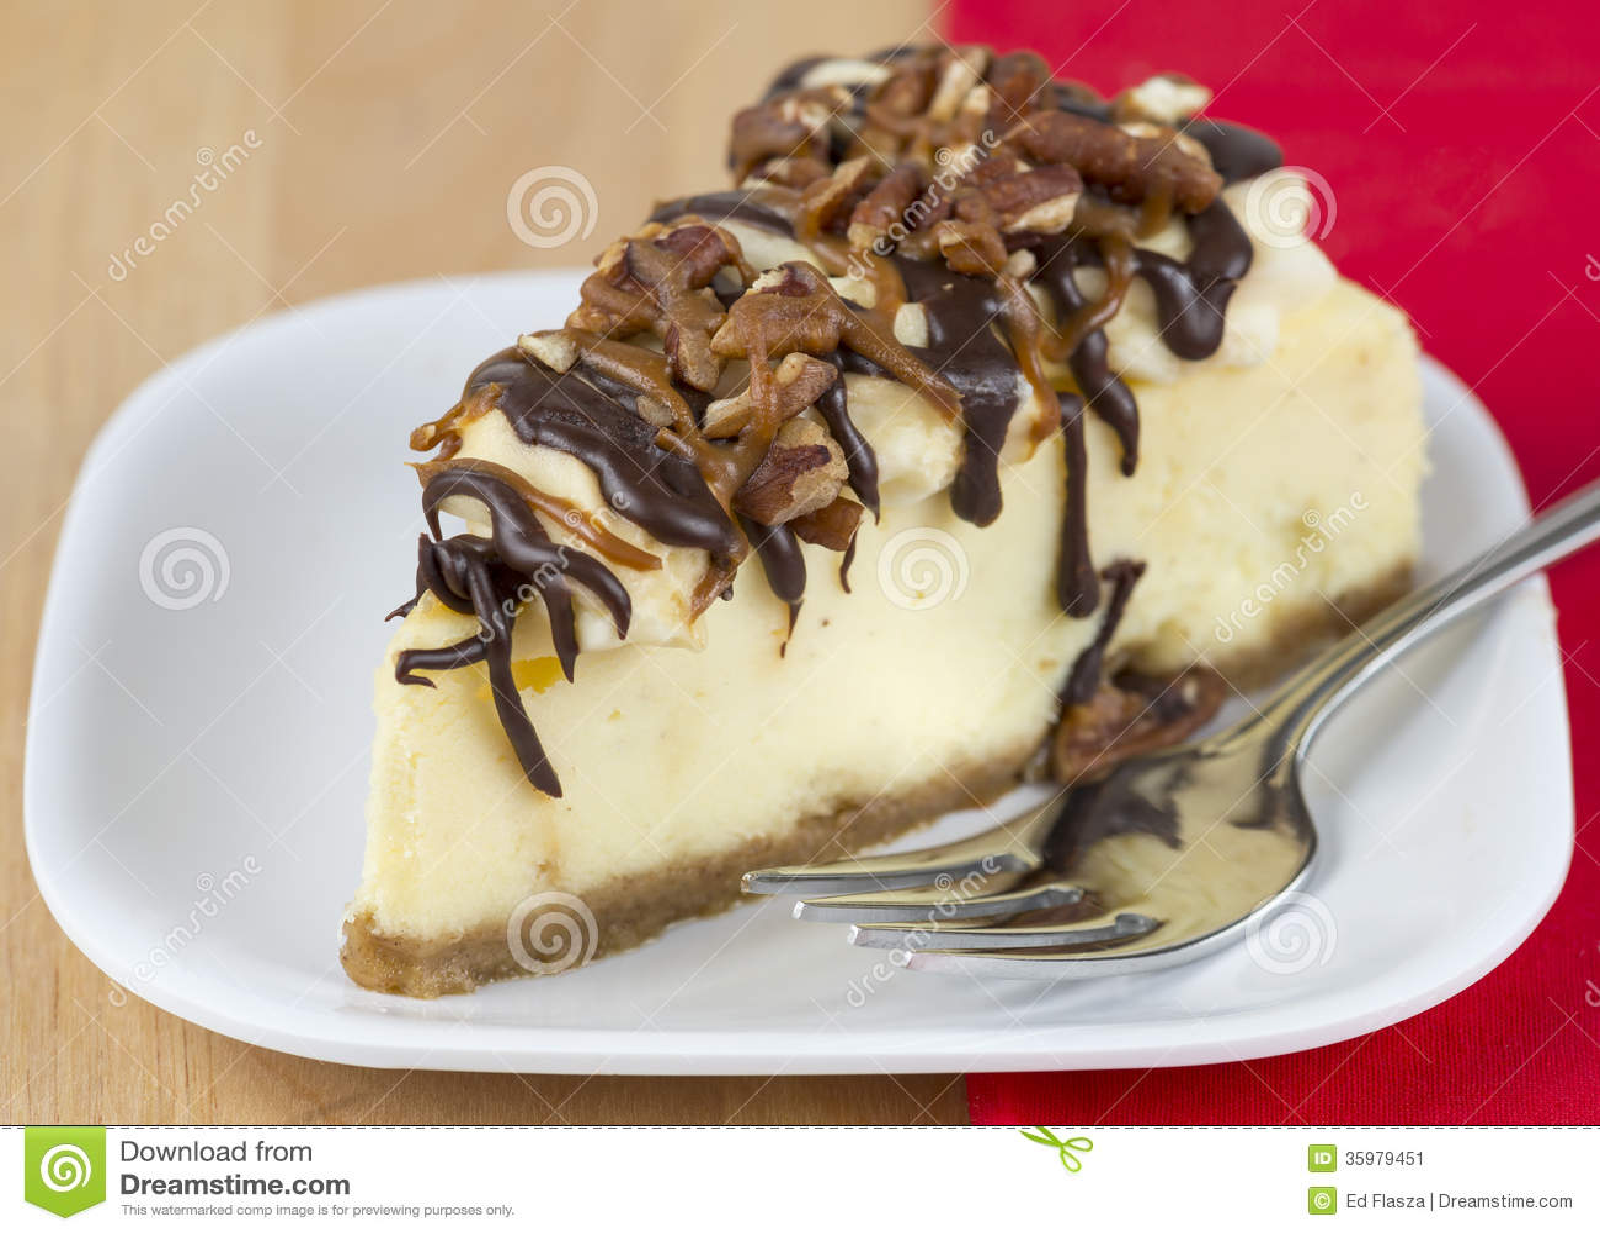 slice of sweet turtle cheesecake.